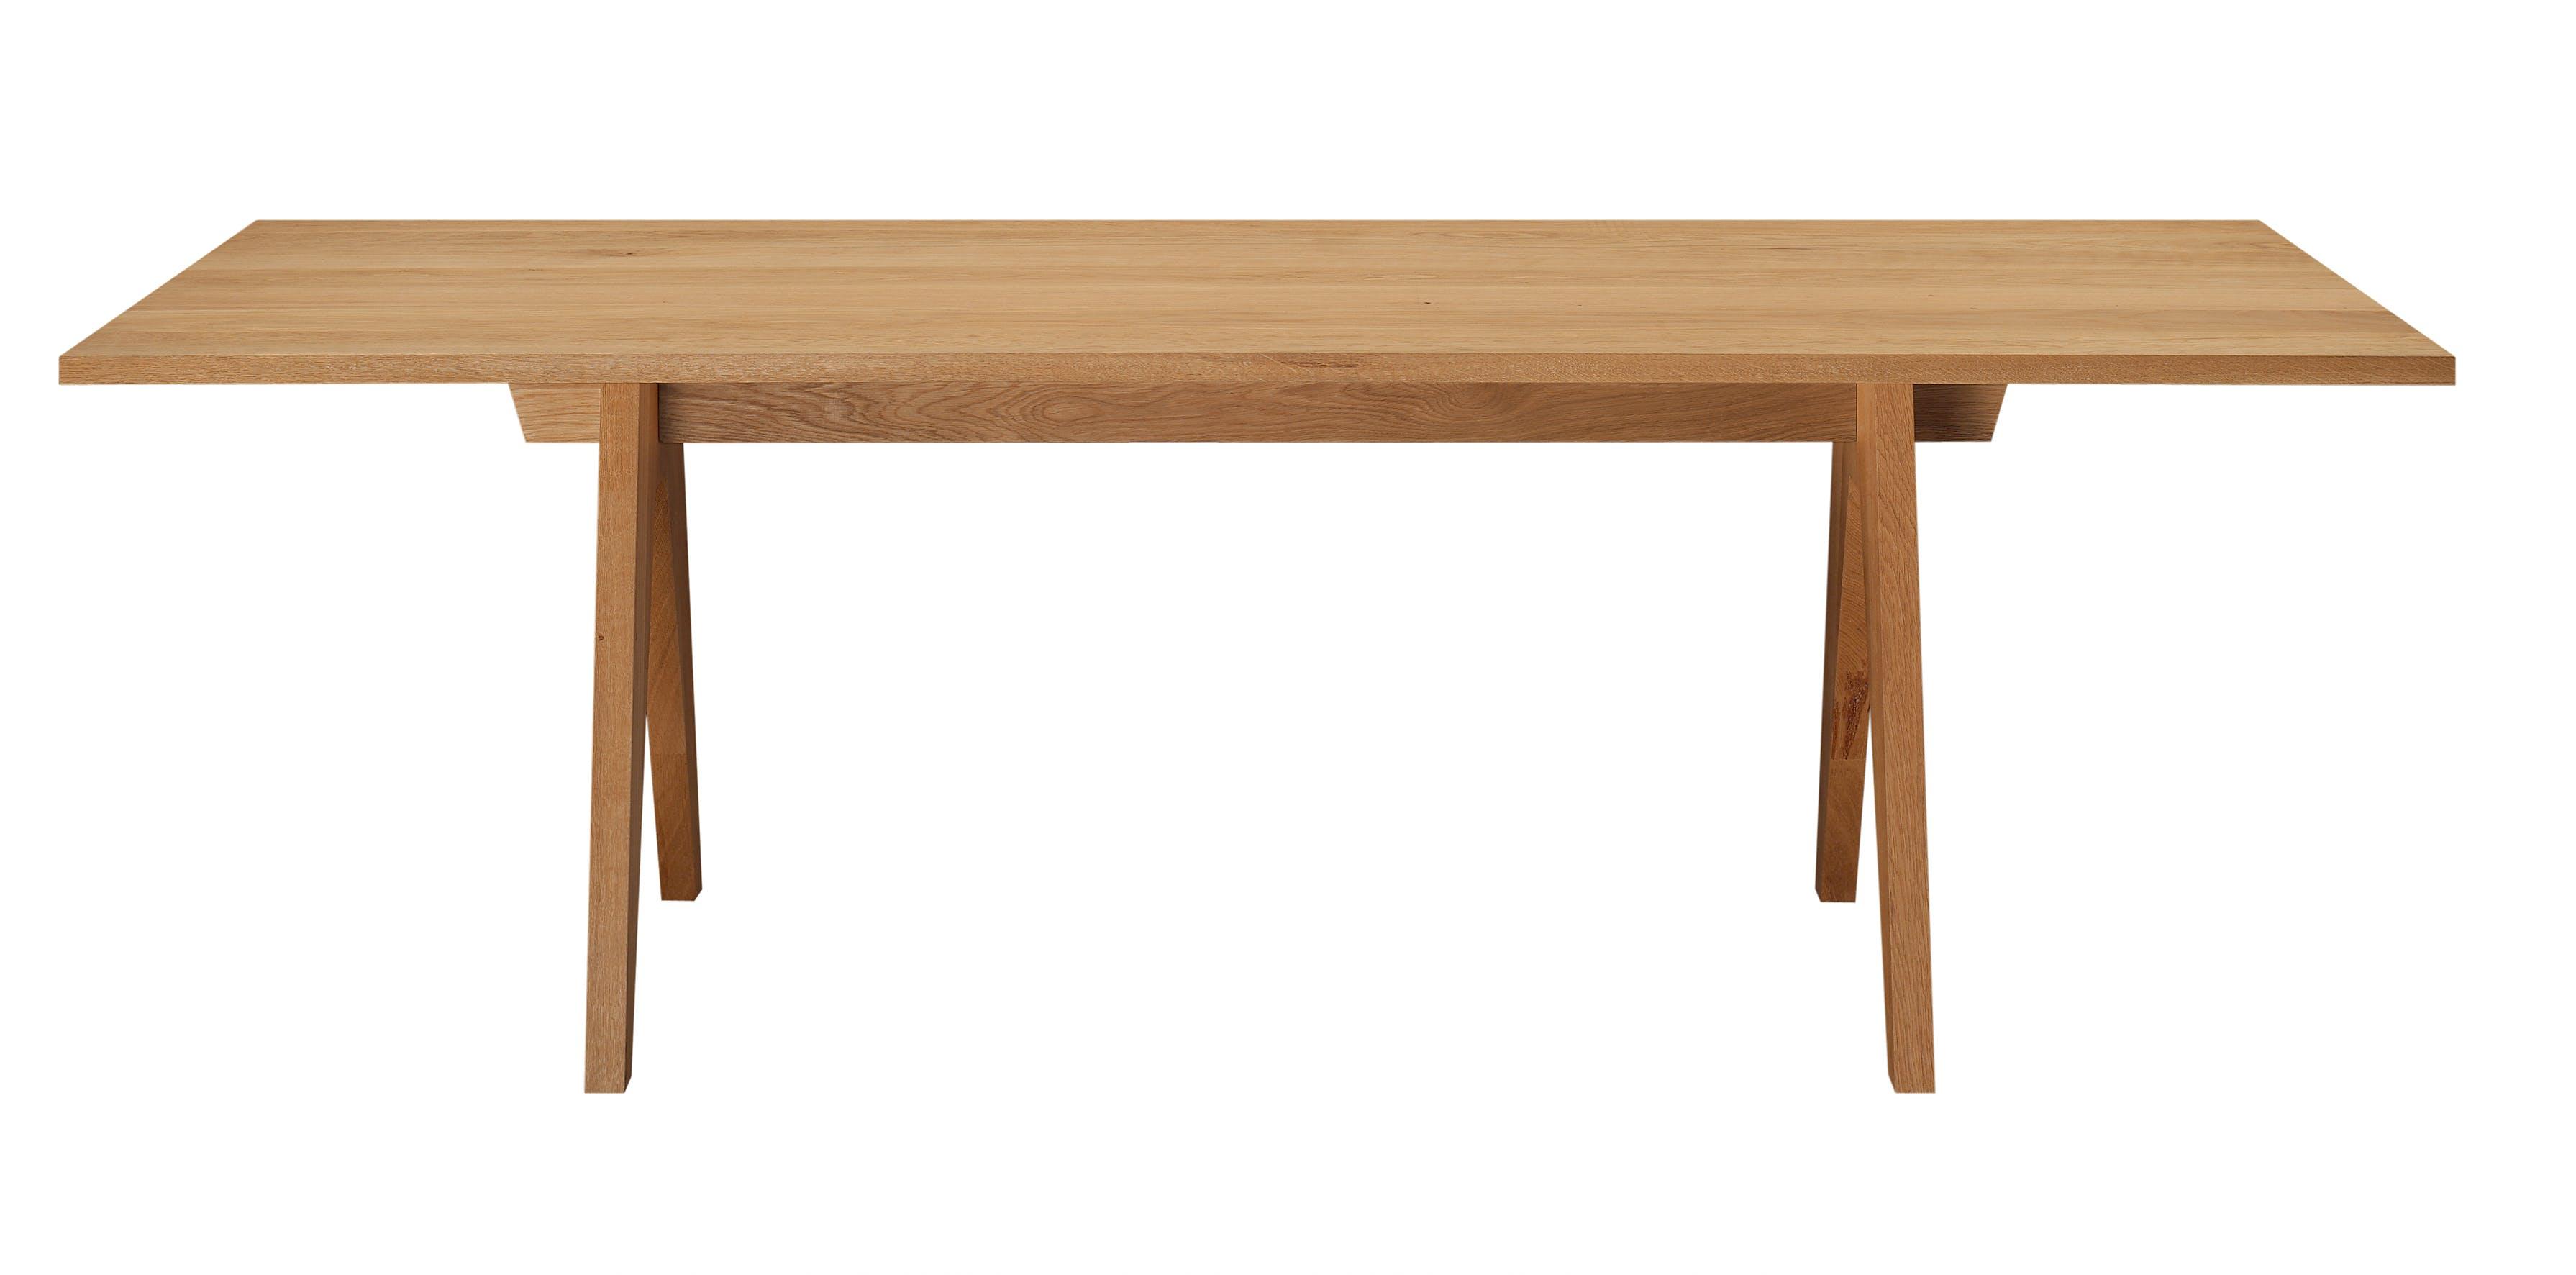 E15-furniture-alden-table-white-haute-living